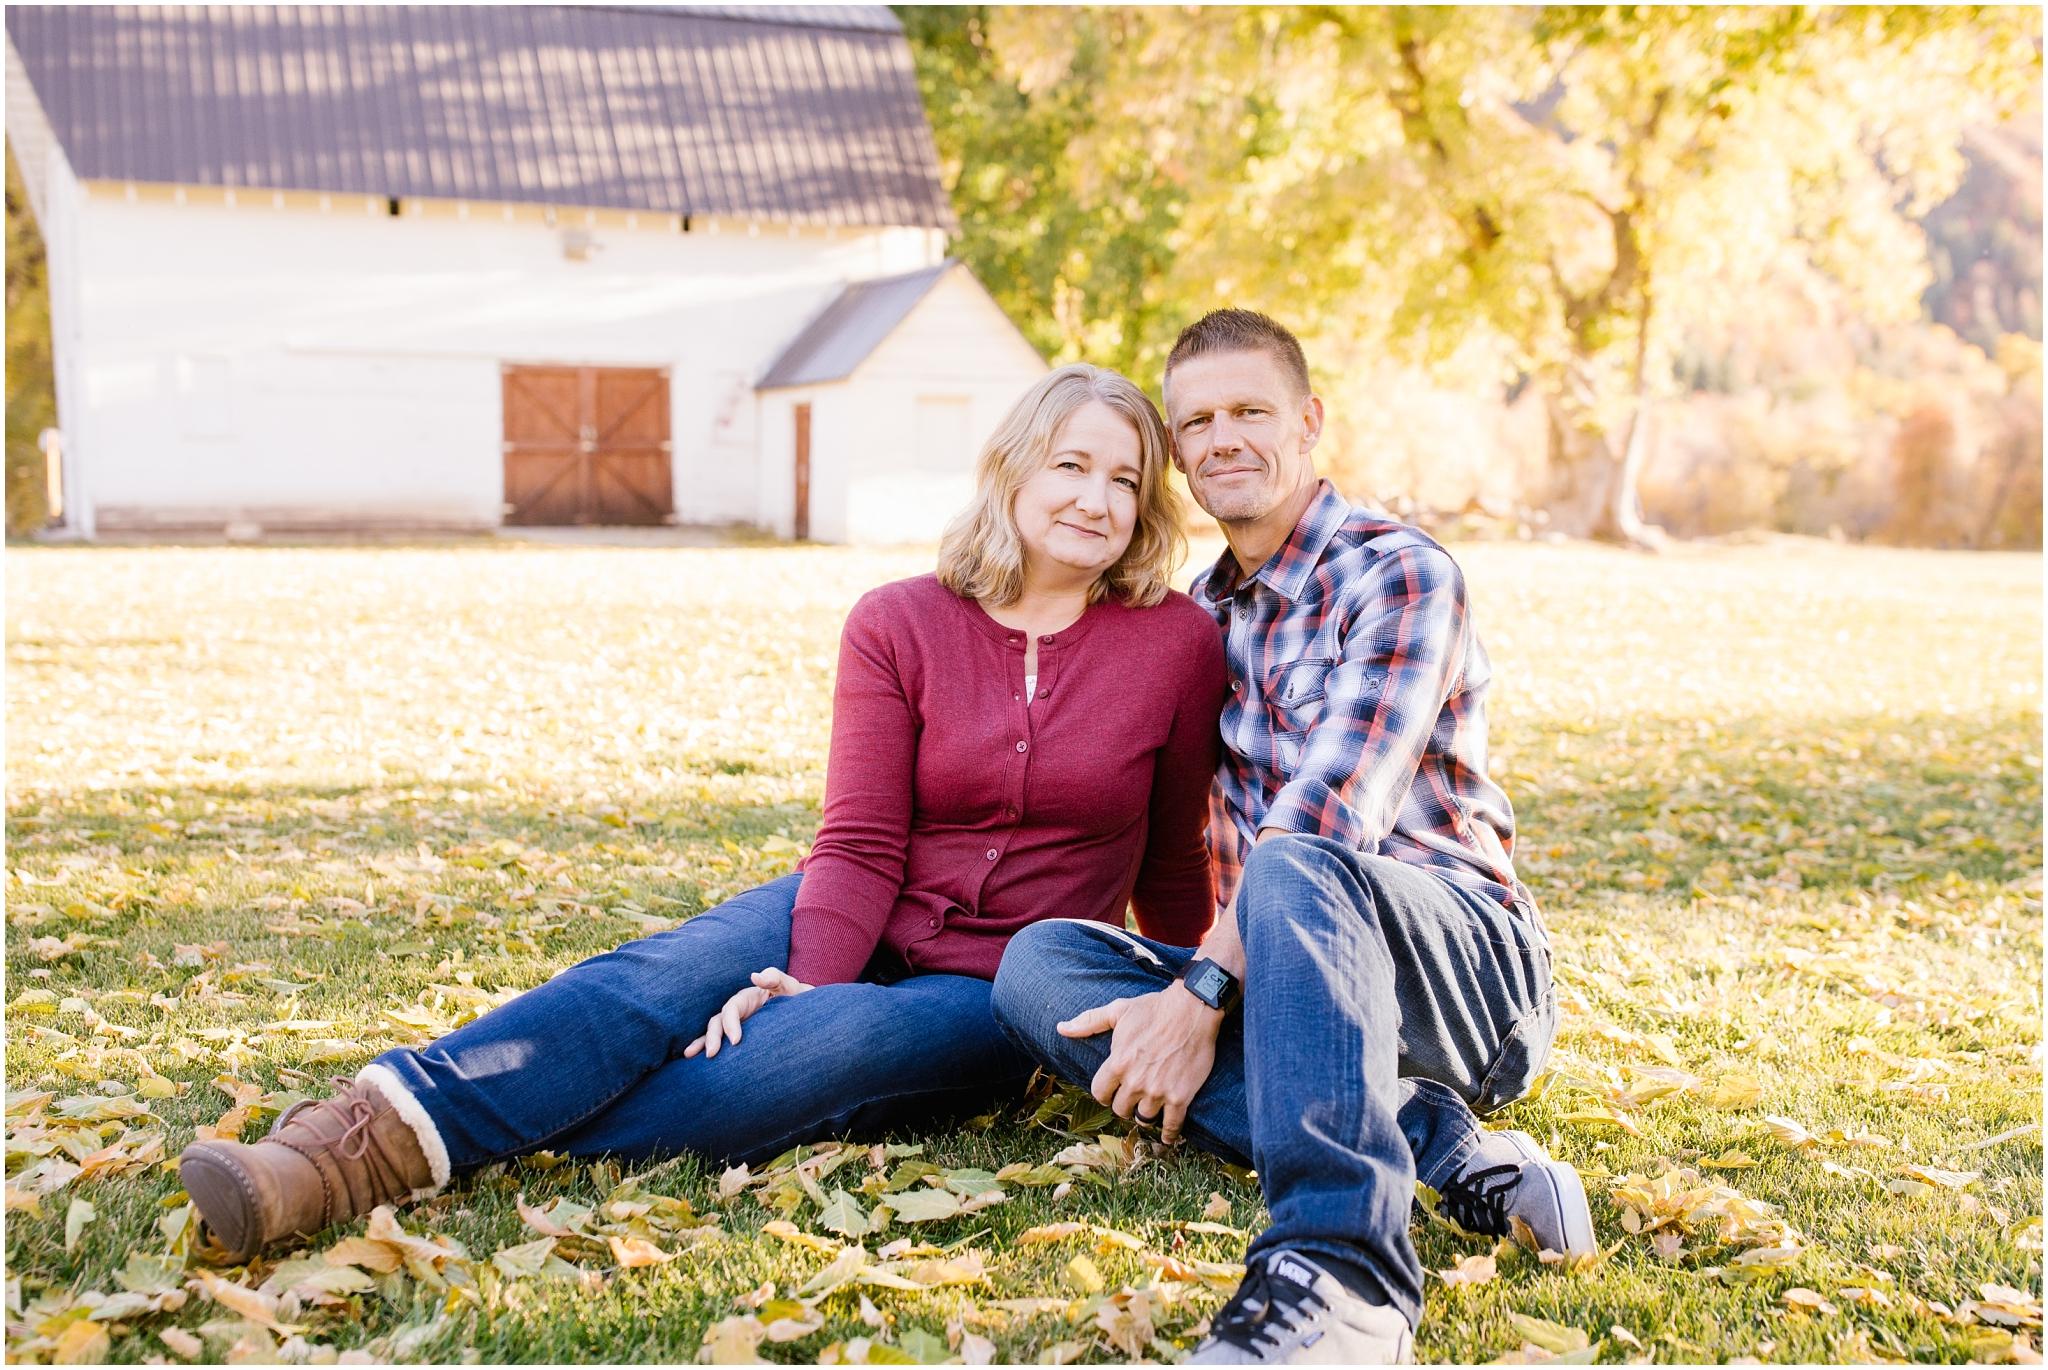 Nielsen--33_Lizzie-B-Imagery-Utah-Family-Photographer-Salt-Lake-City-Park-City-Utah-County-Hobble-Creek-Canyon-Jolleys-Ranch.jpg